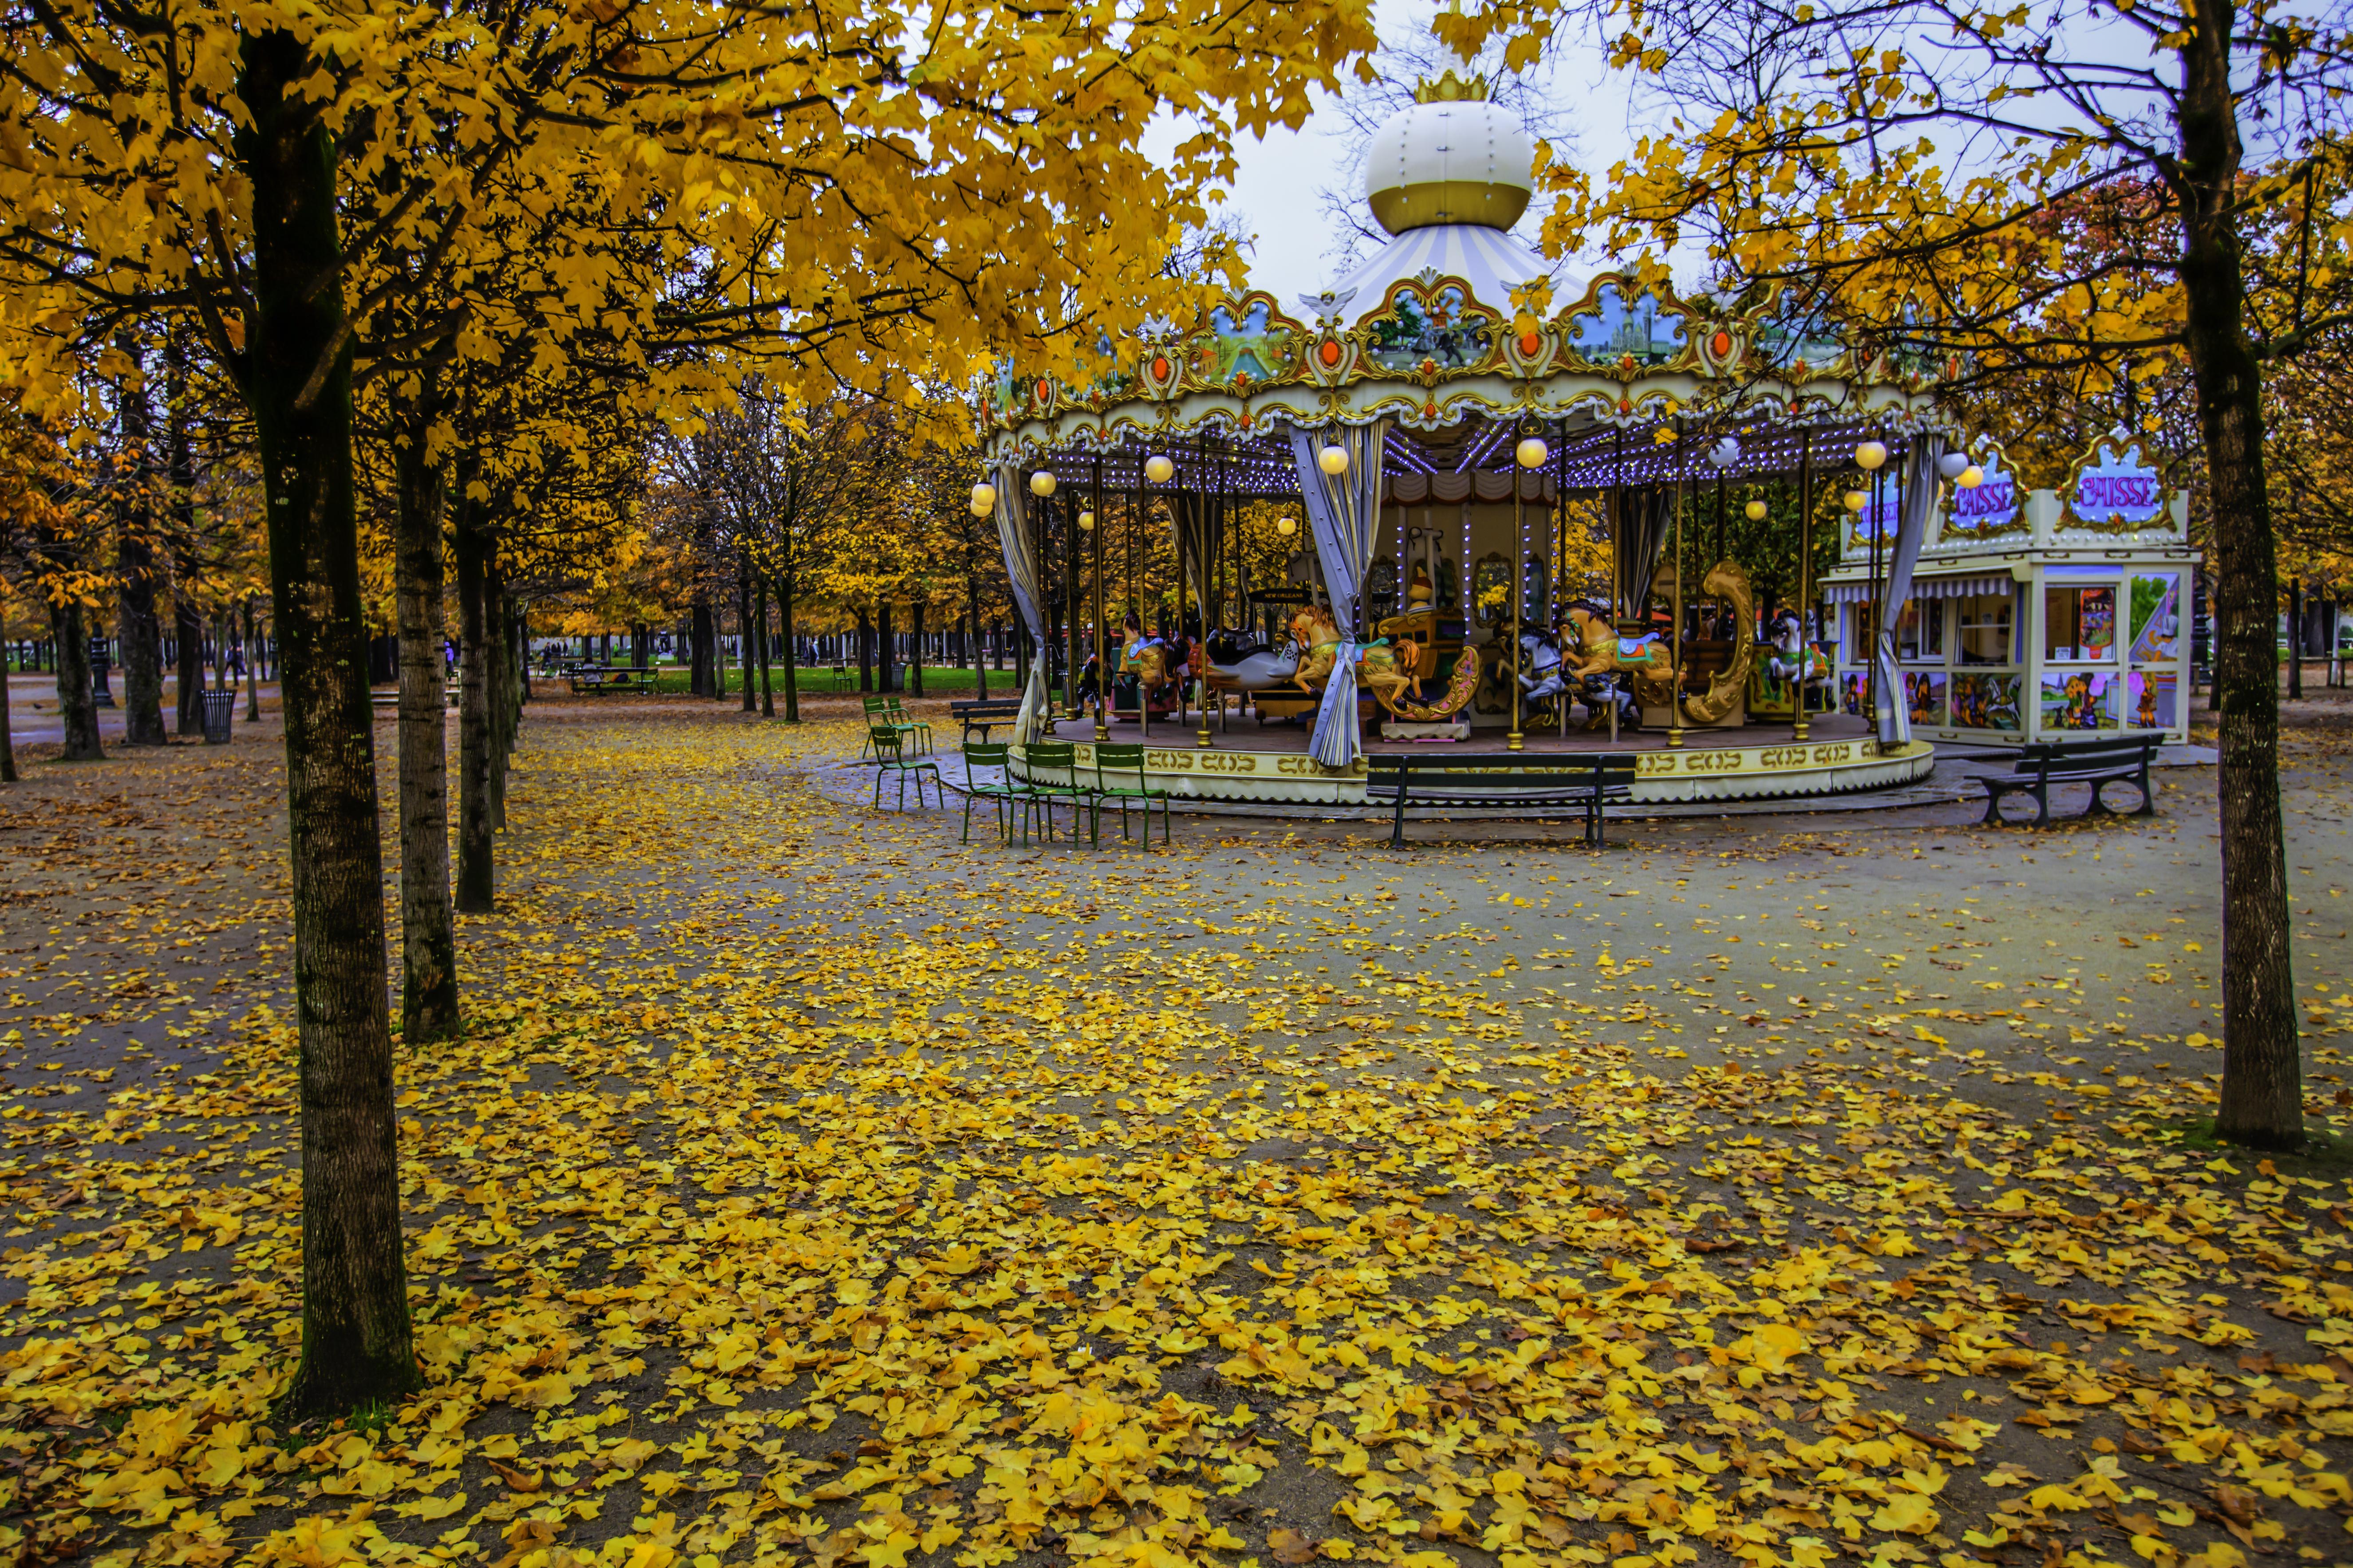 fileautumn tuileries garden paris 13 november 2012jpg - Tuileries Garden